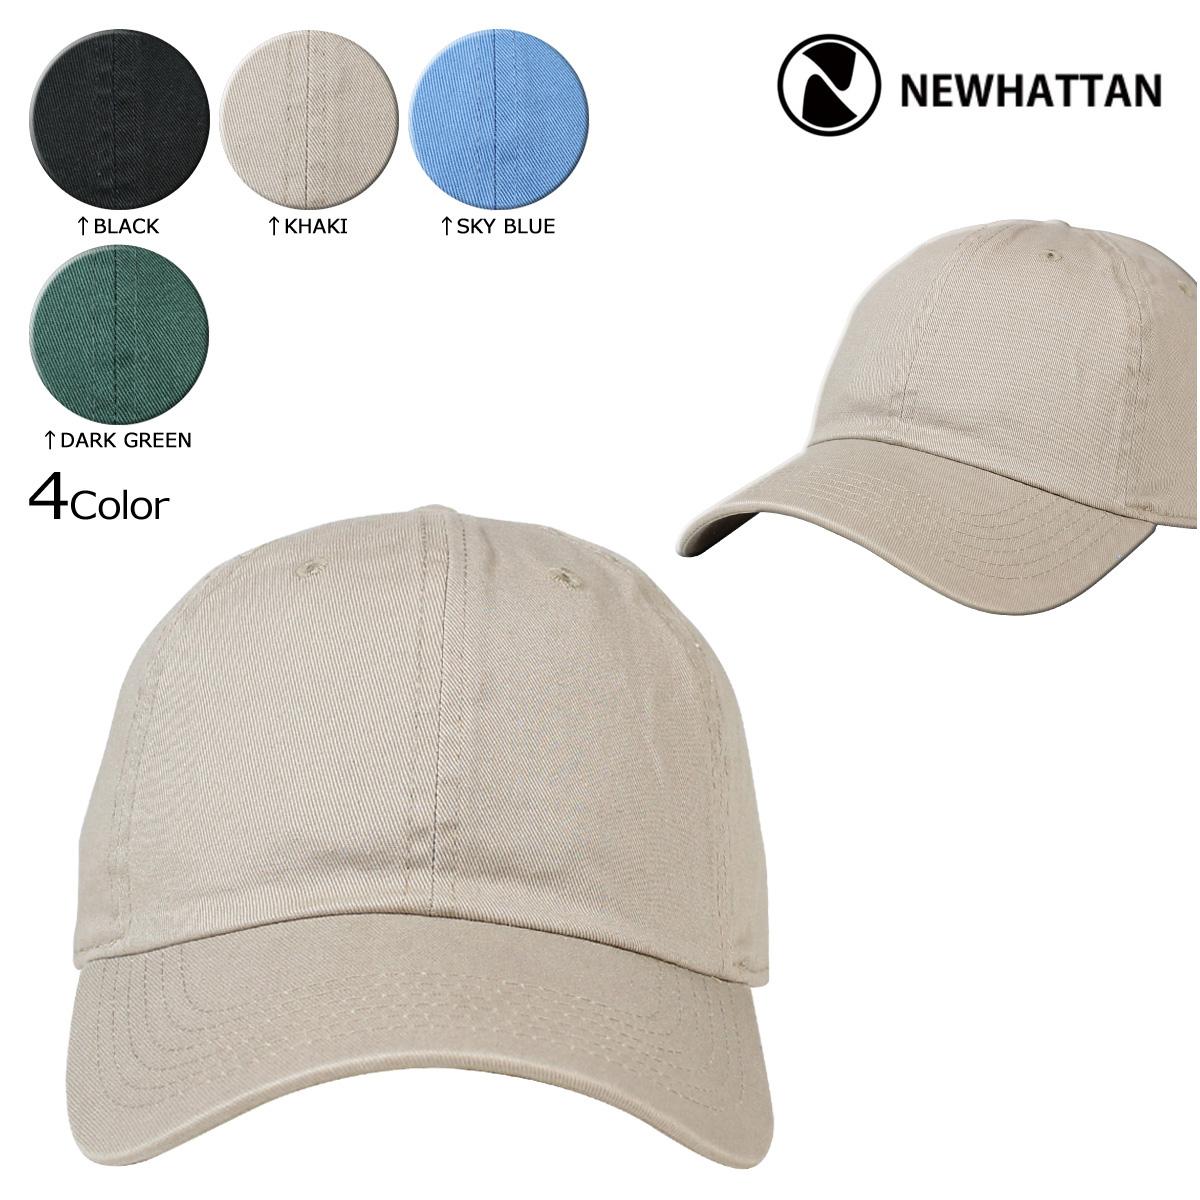 NEWHATTAN nyuhattan帽子蓋子洗滌蓋子人分歧D